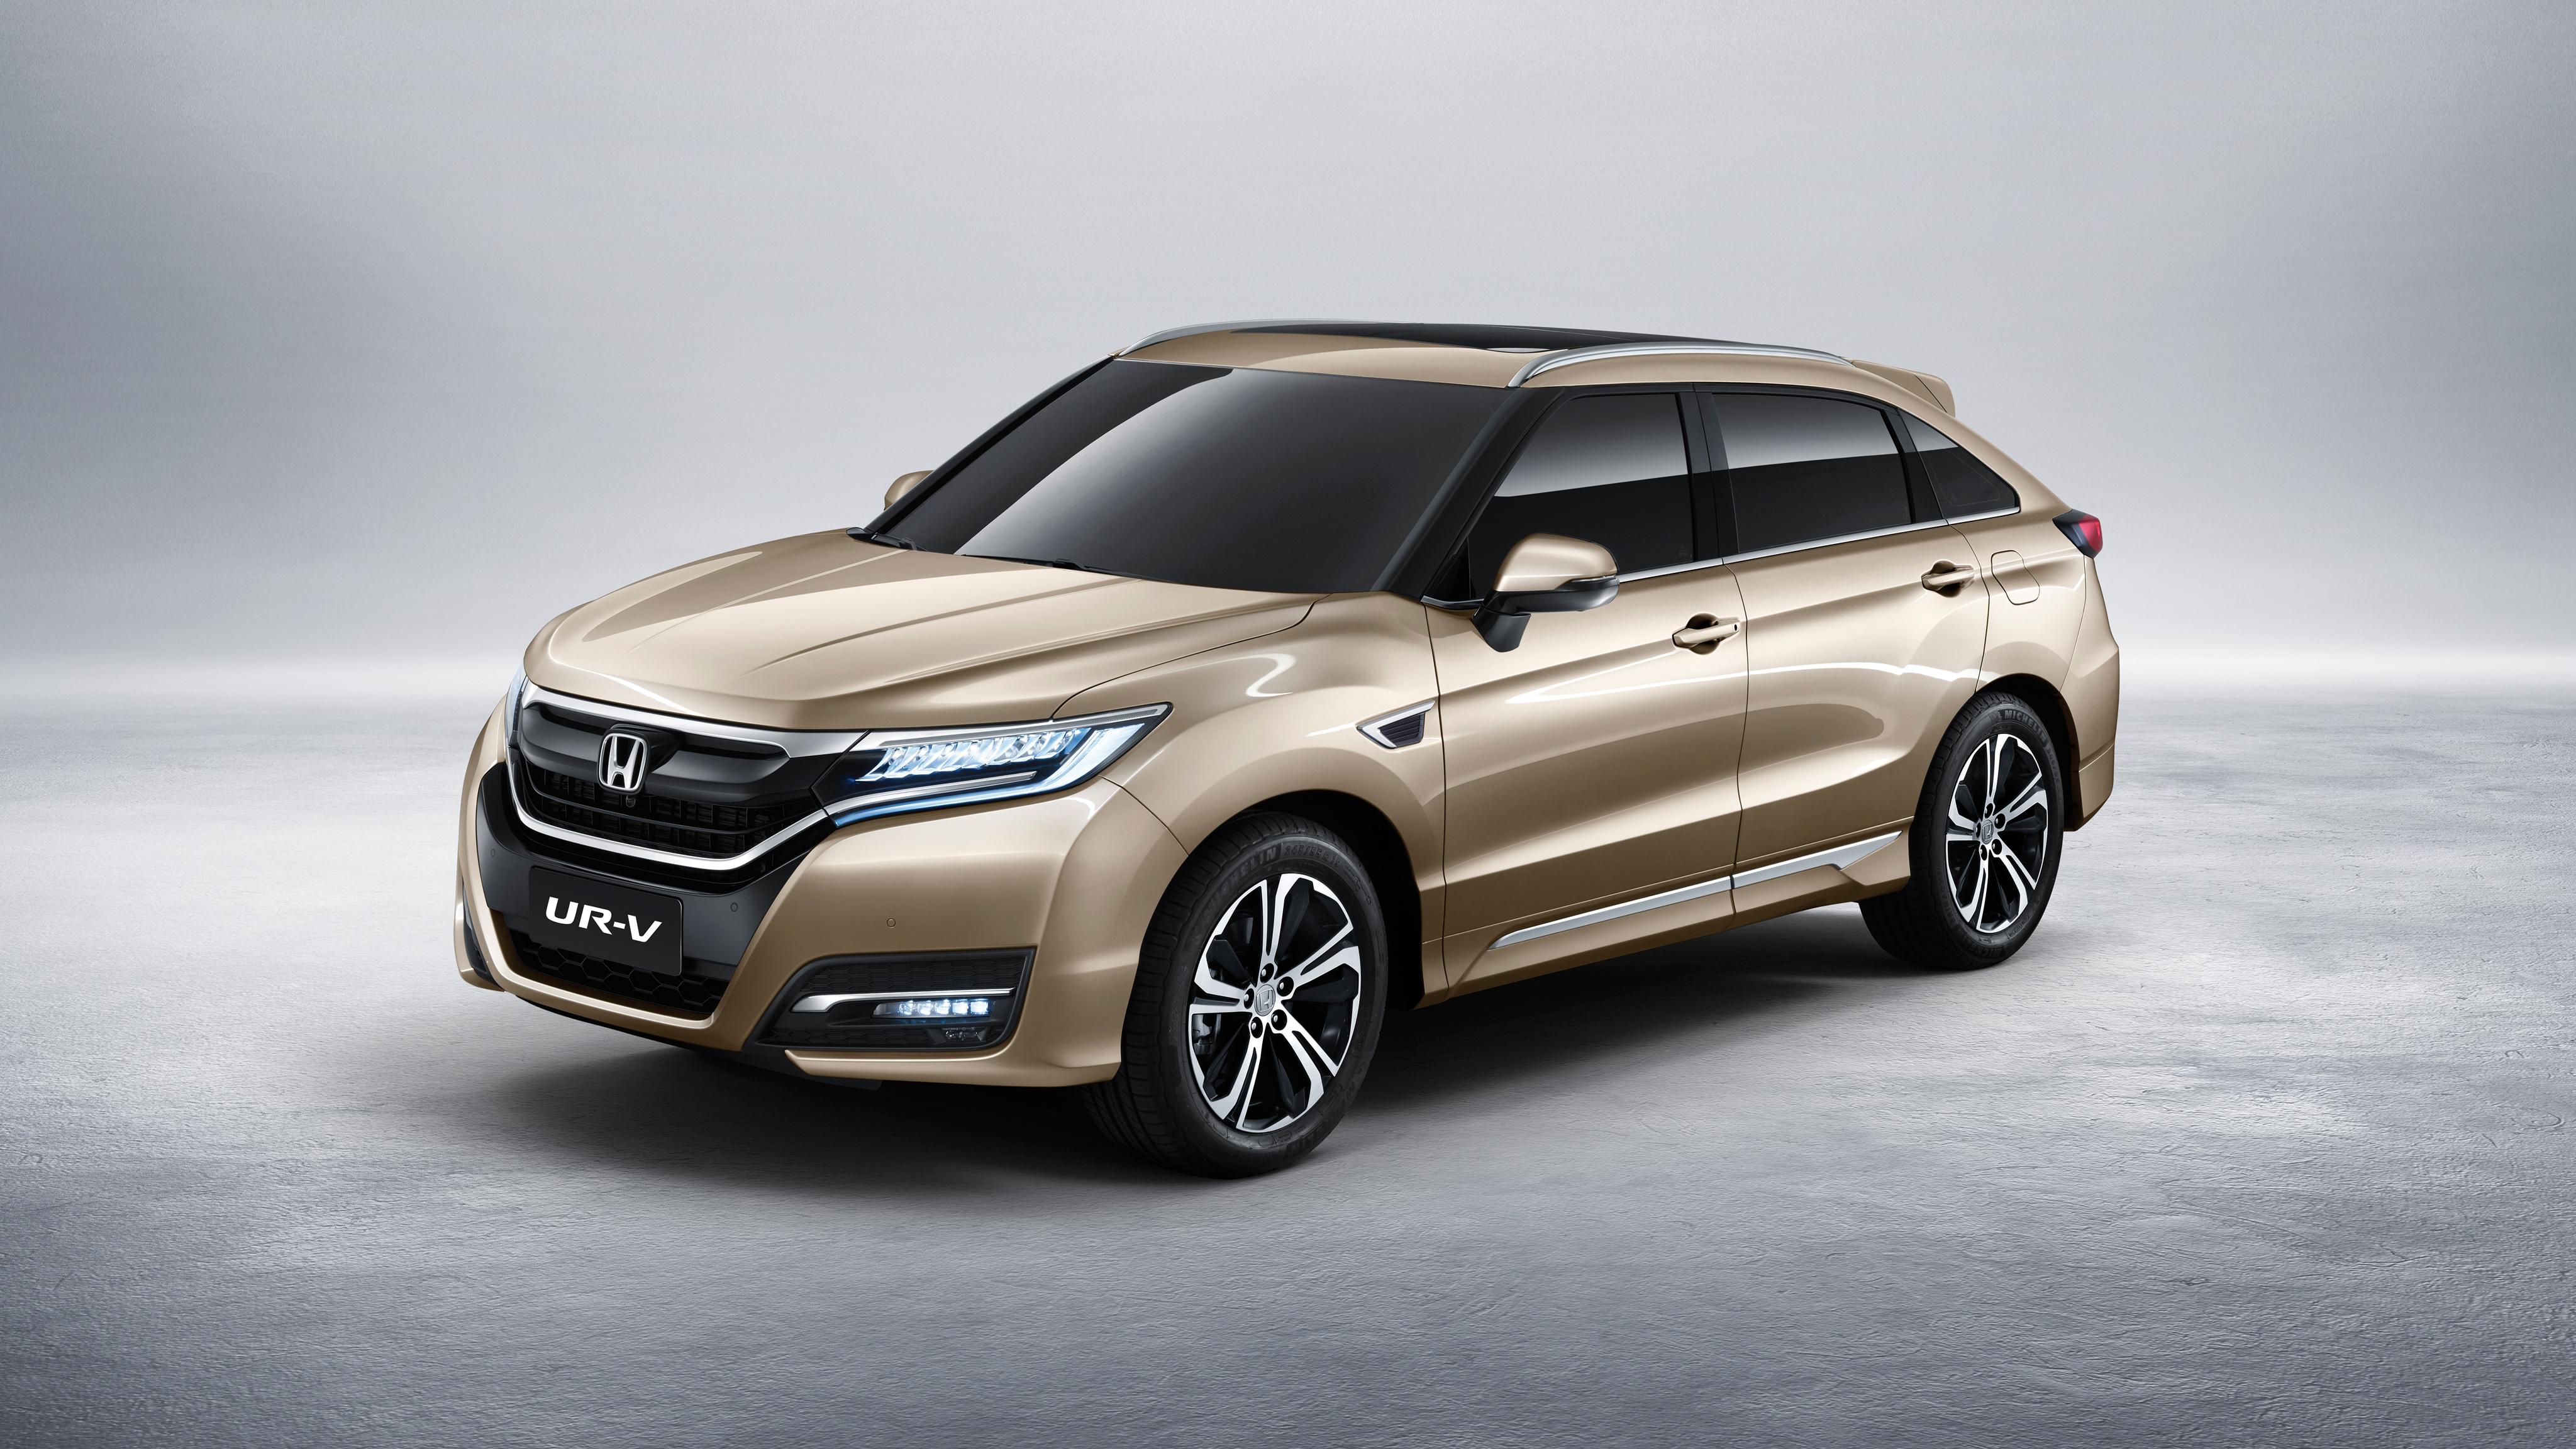 2017 Honda UR V 4K Wallpaper